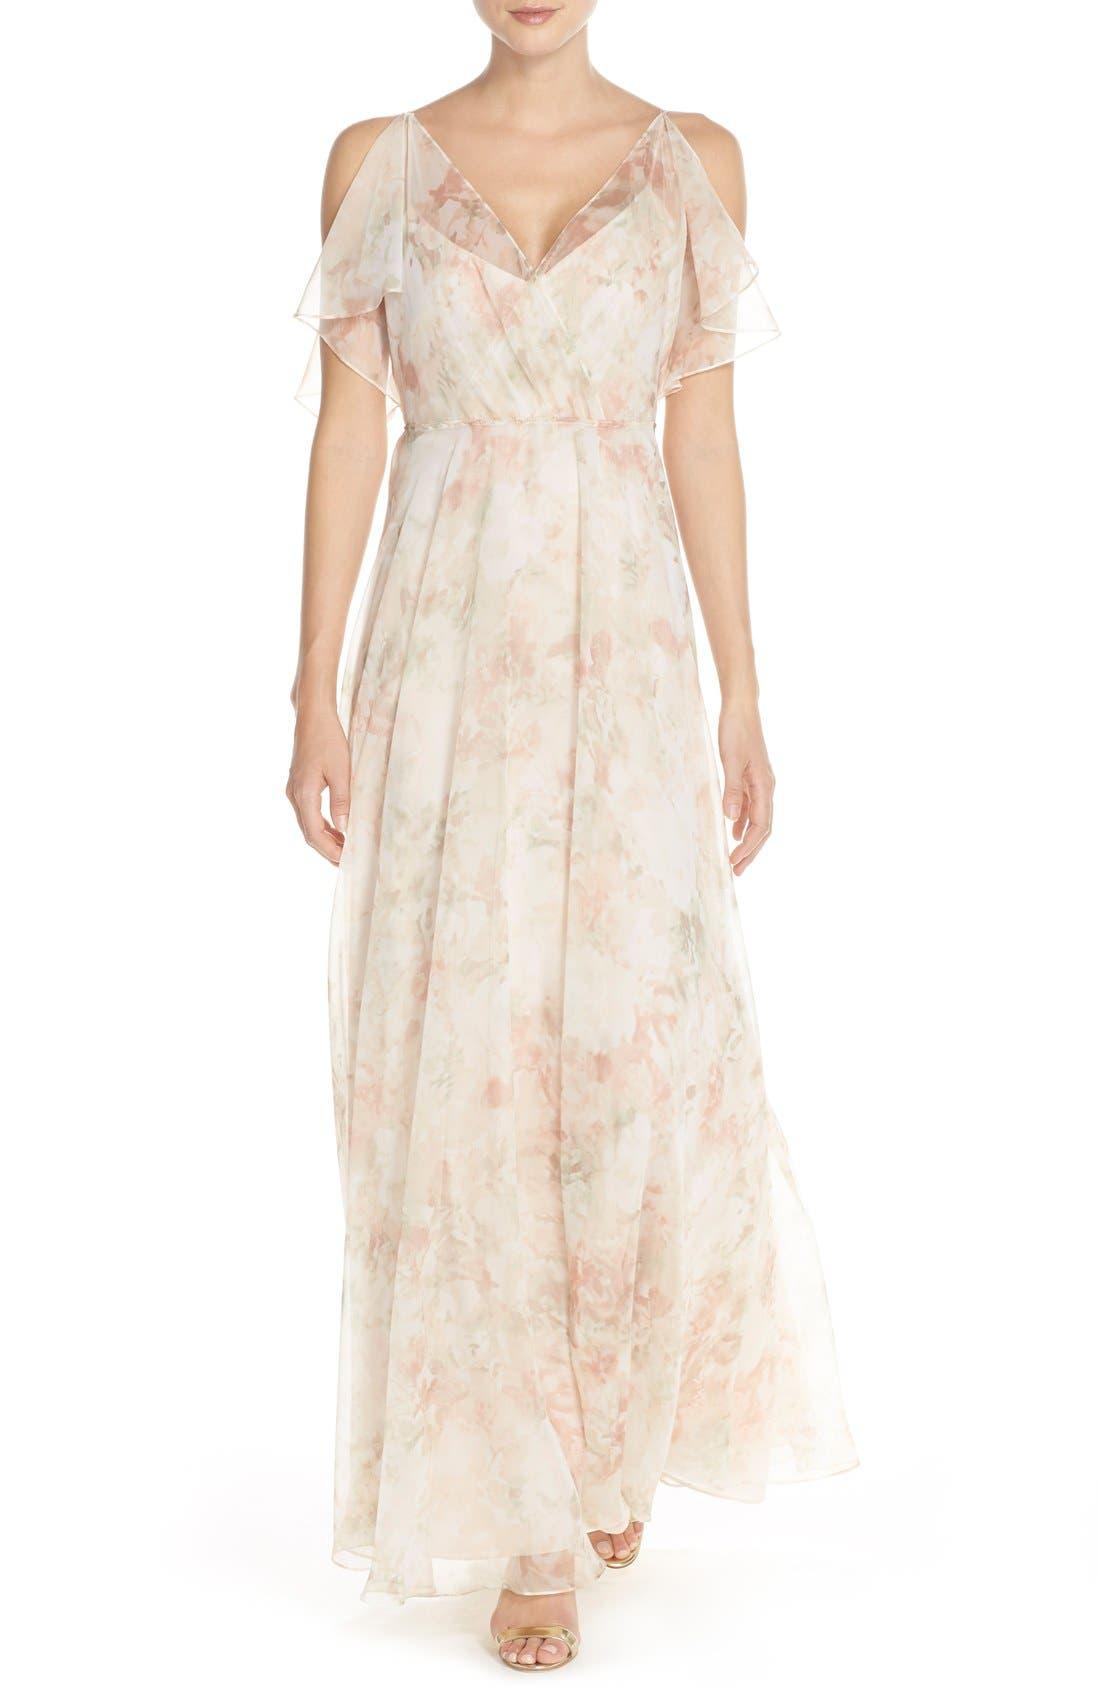 Alternate Image 1 Selected - Jenny Yoo 'Cassie' Print Flutter Sleeve Chiffon Maxi Dress